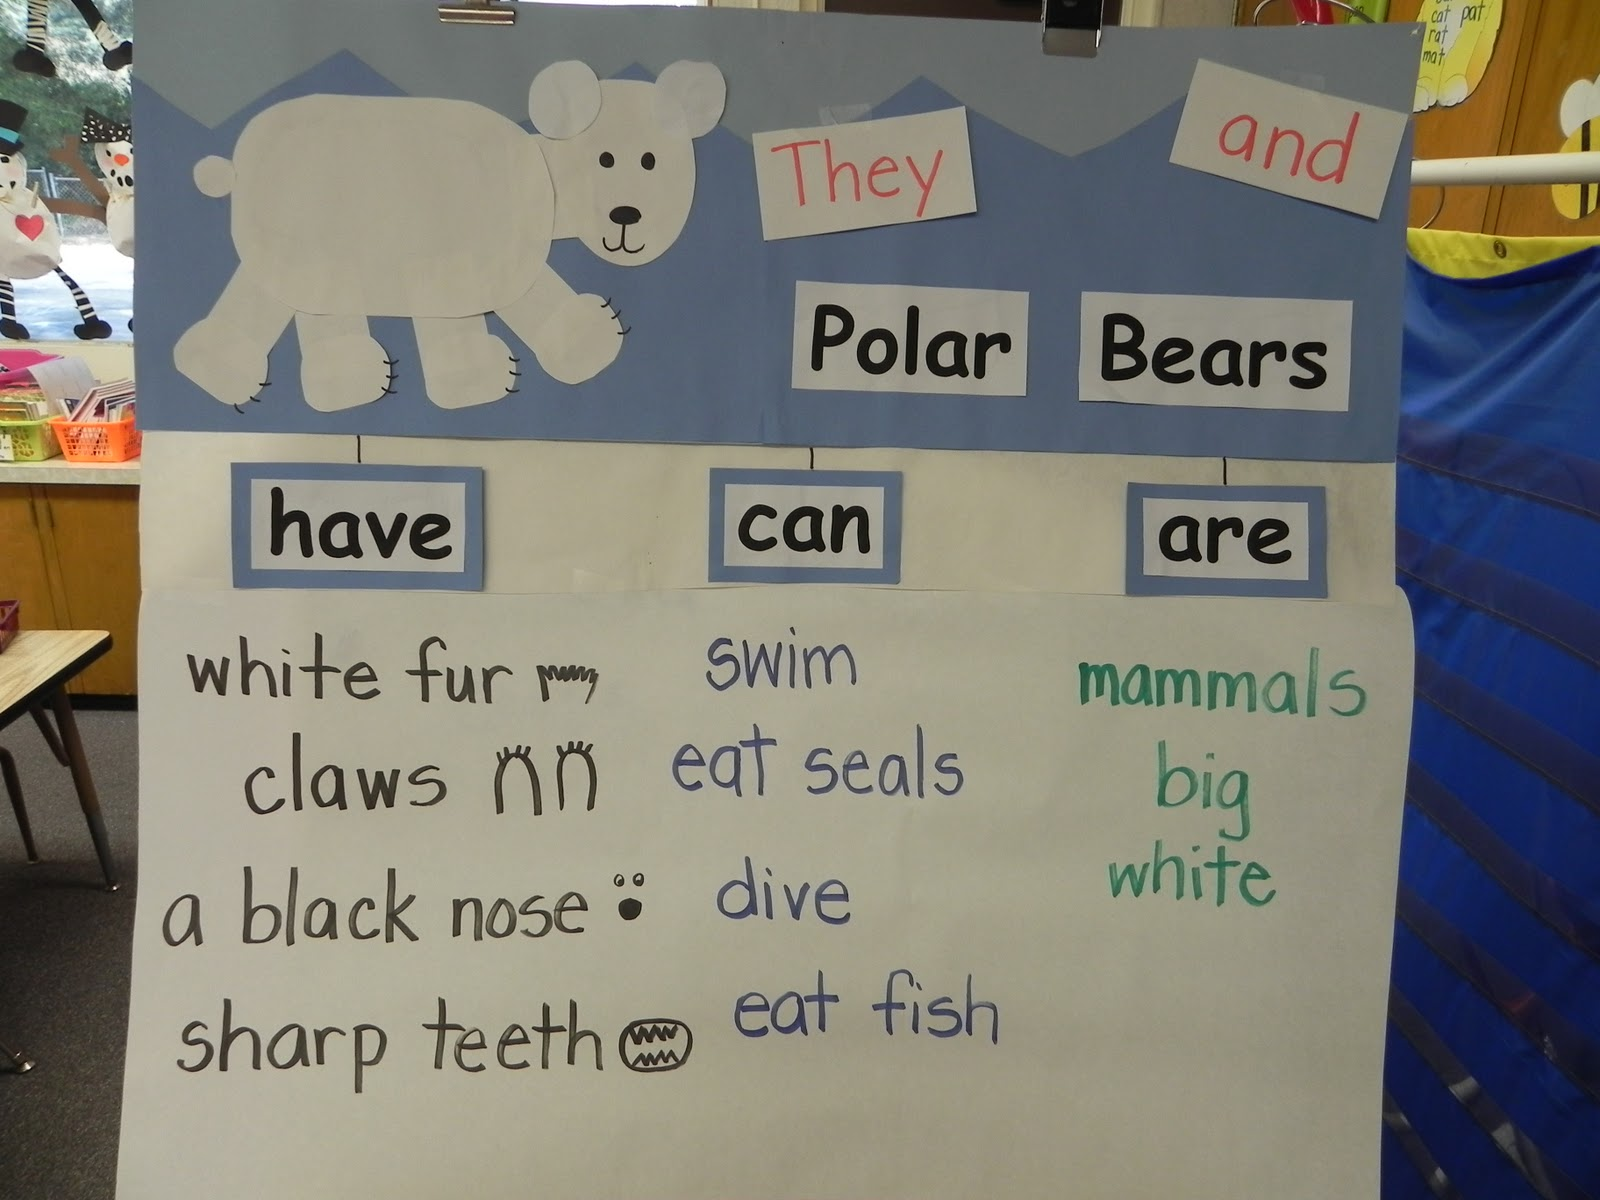 short essay on polar bears